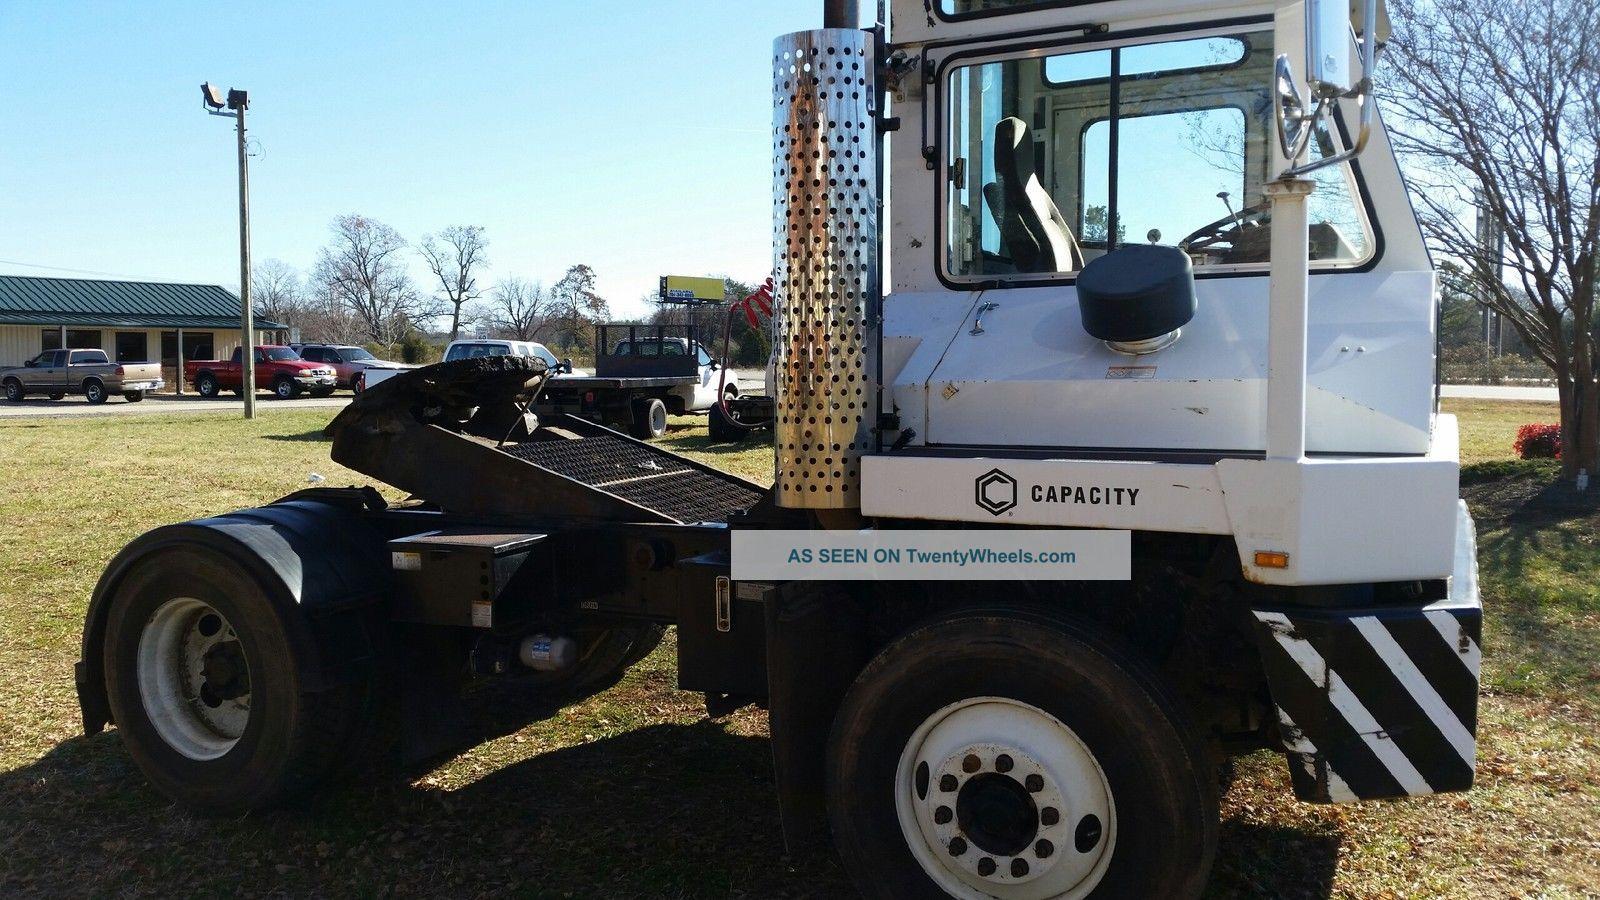 Yard Switcher Trucks Related Keywords & Suggestions - Yard ...